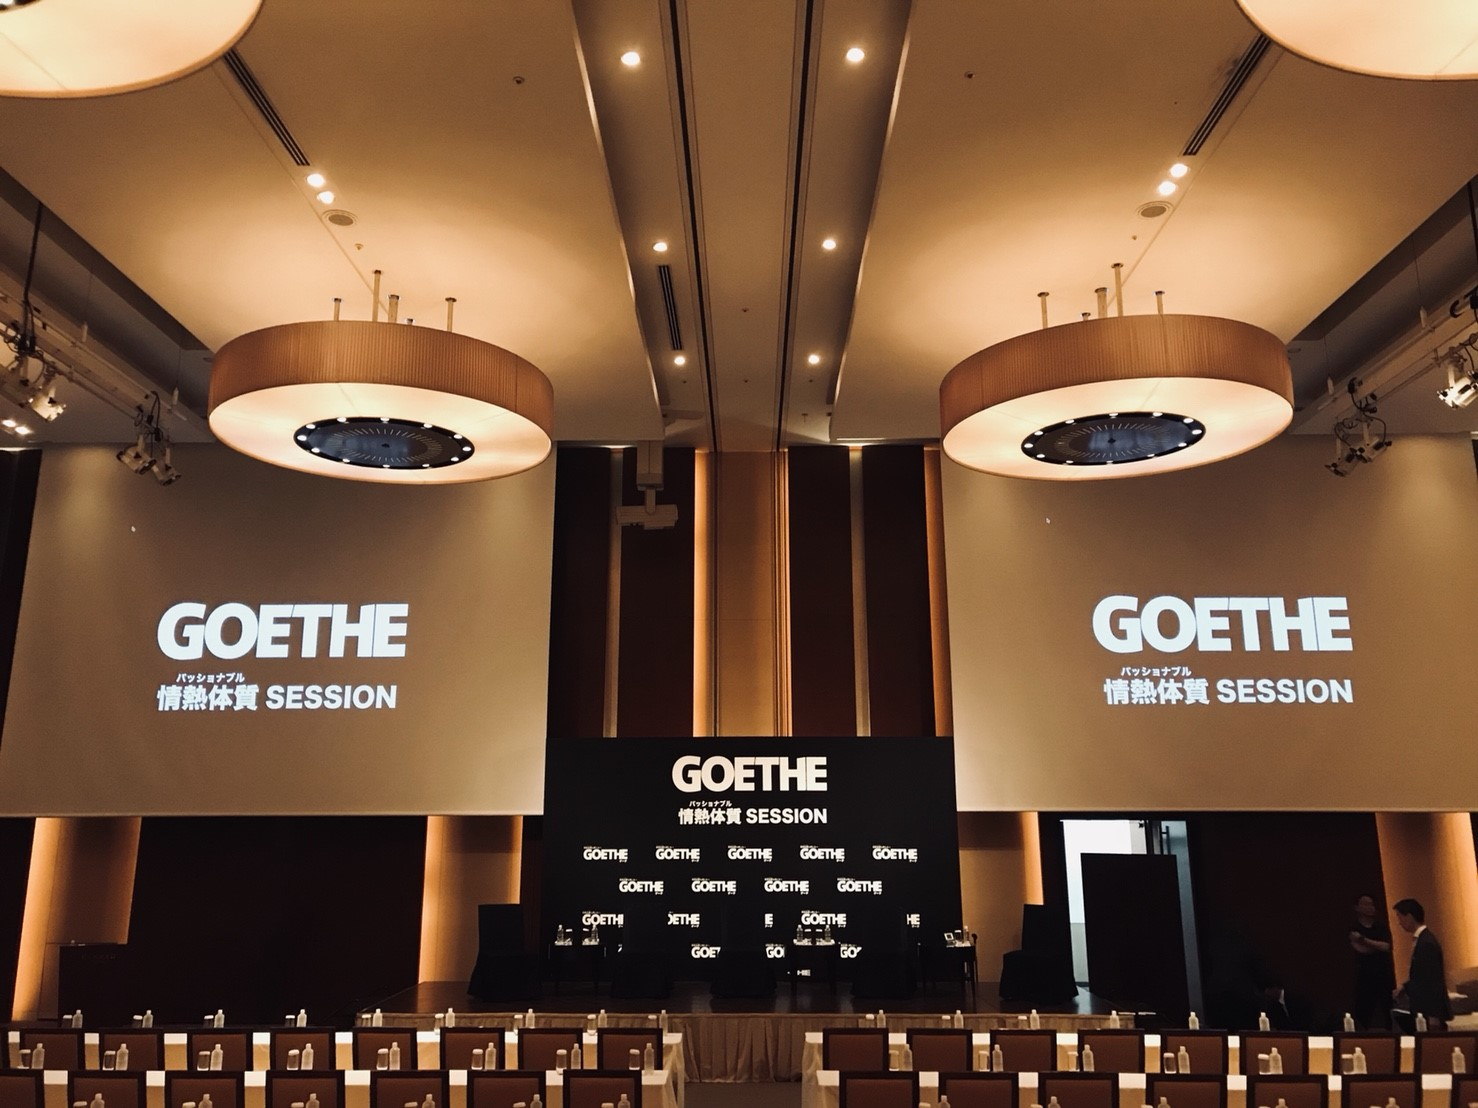 GOETHE  創刊12周年記念「GOETHE 常熱体質SESSION」